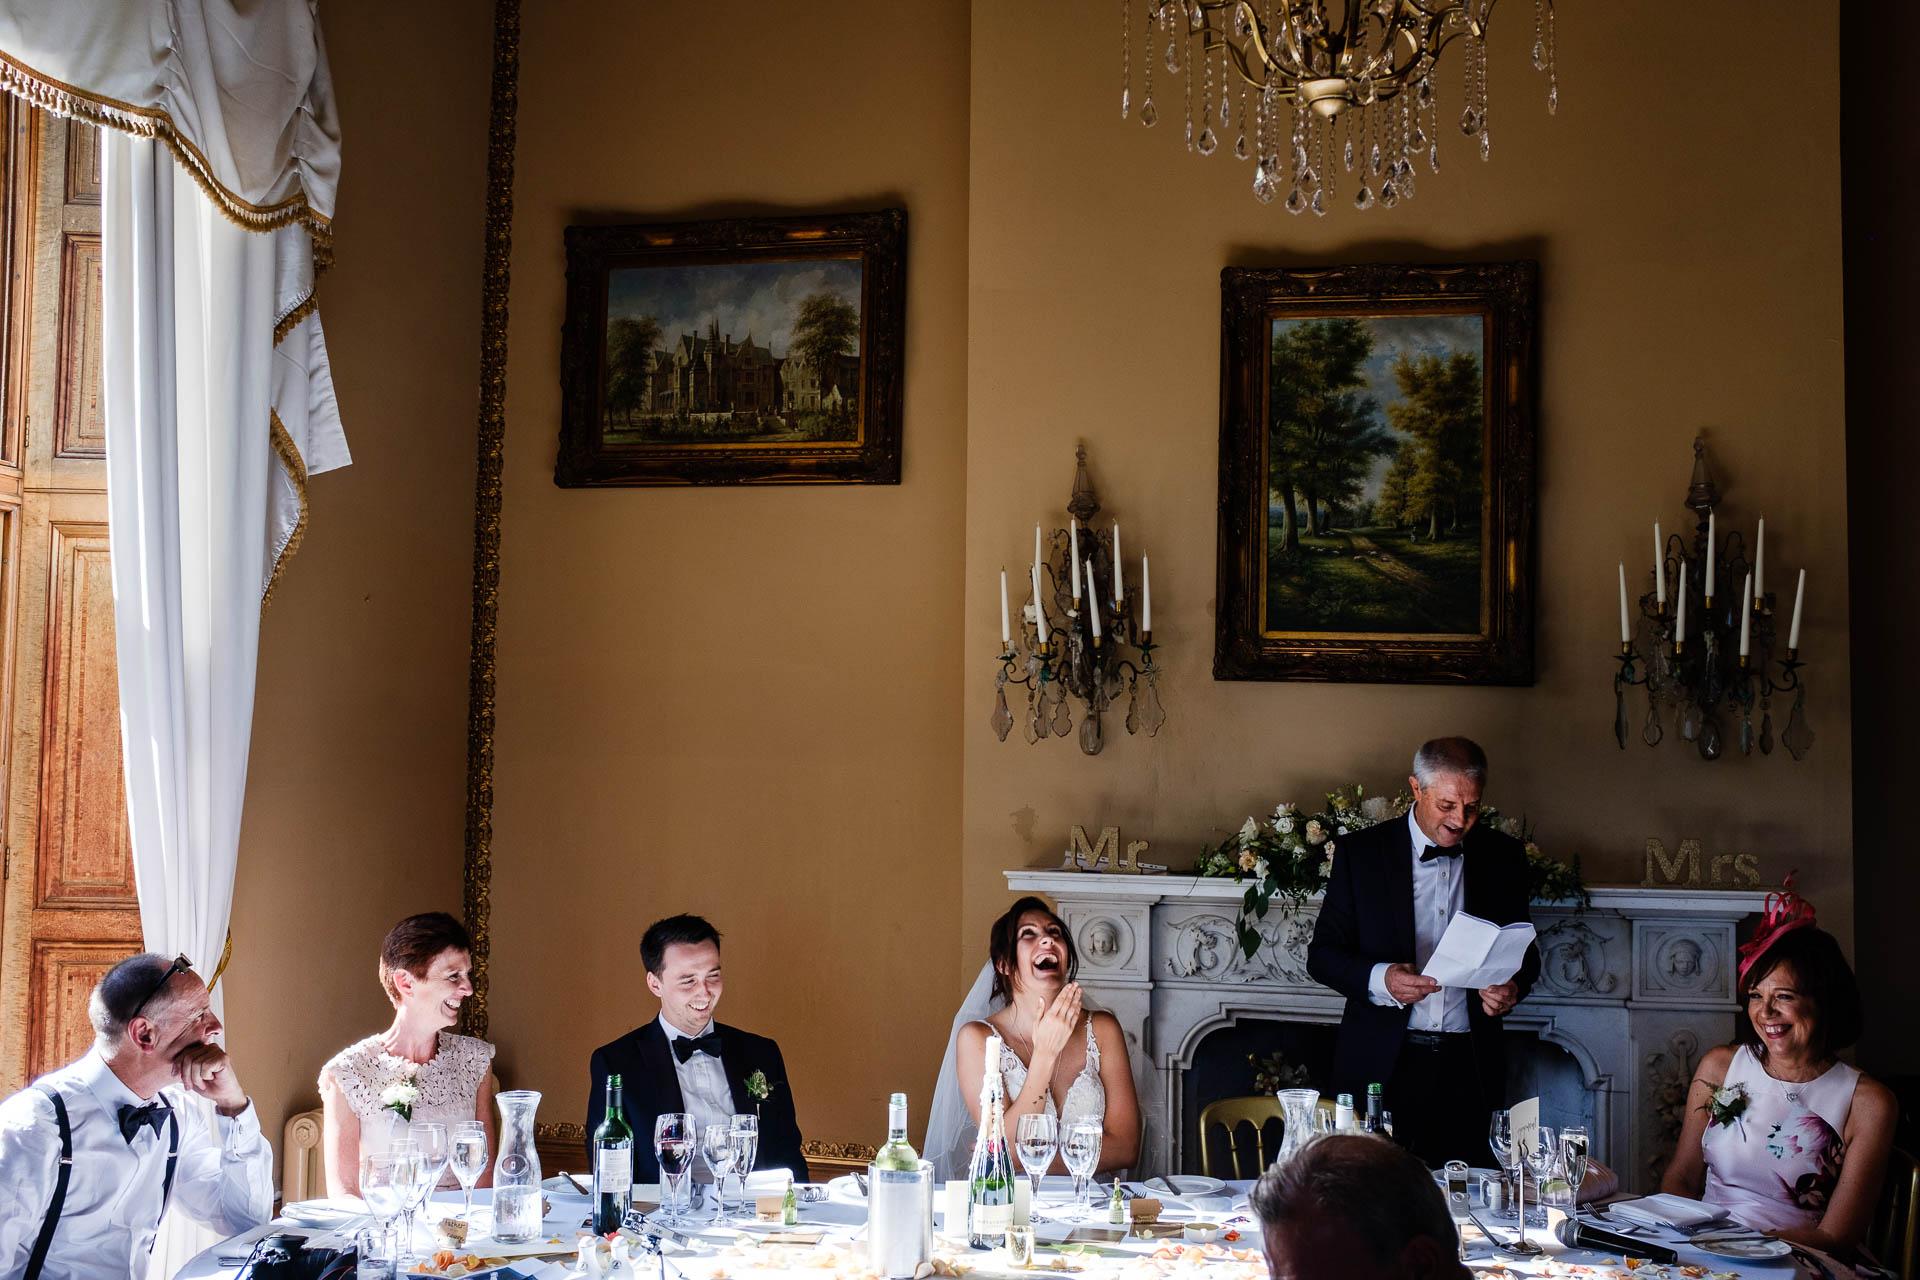 orchardleigh house wedding - Danni & Barney (335).jpg